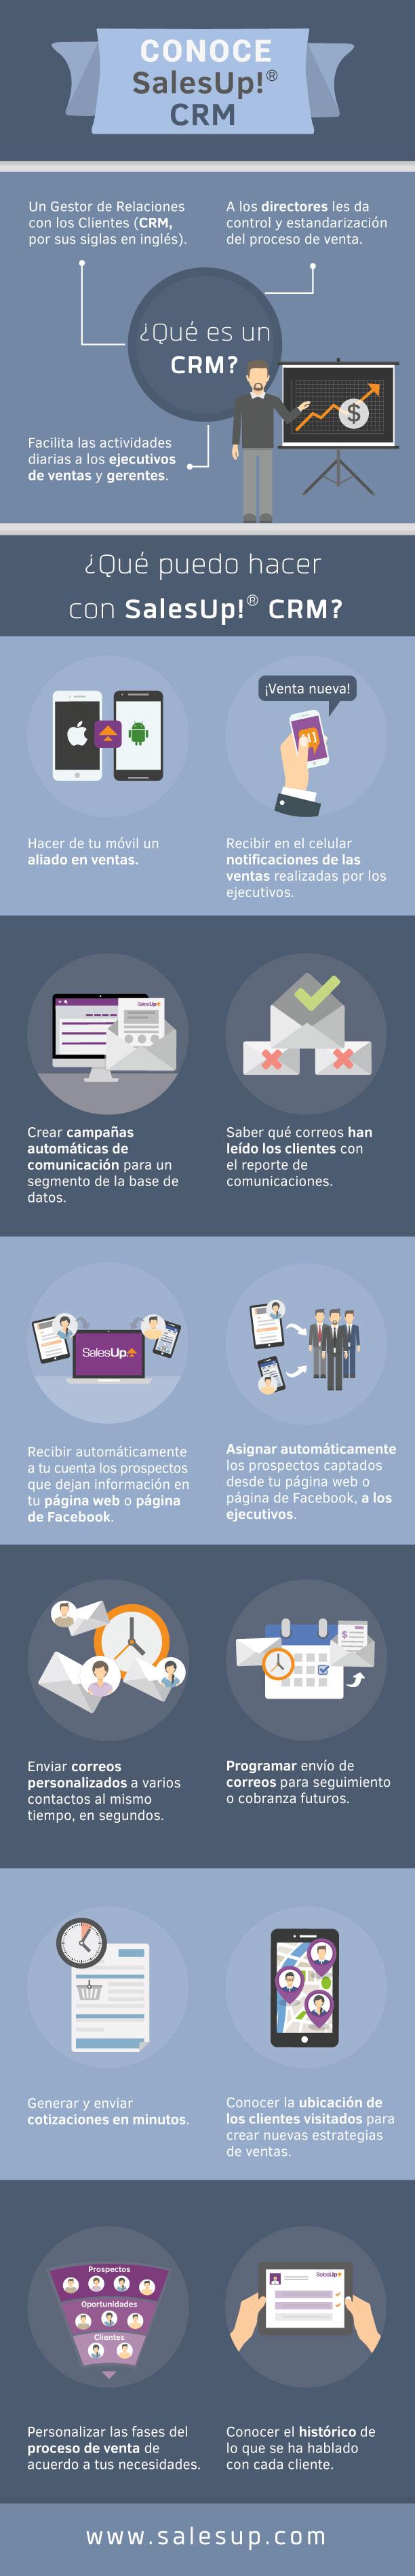 infografia conoce Salesup CRM